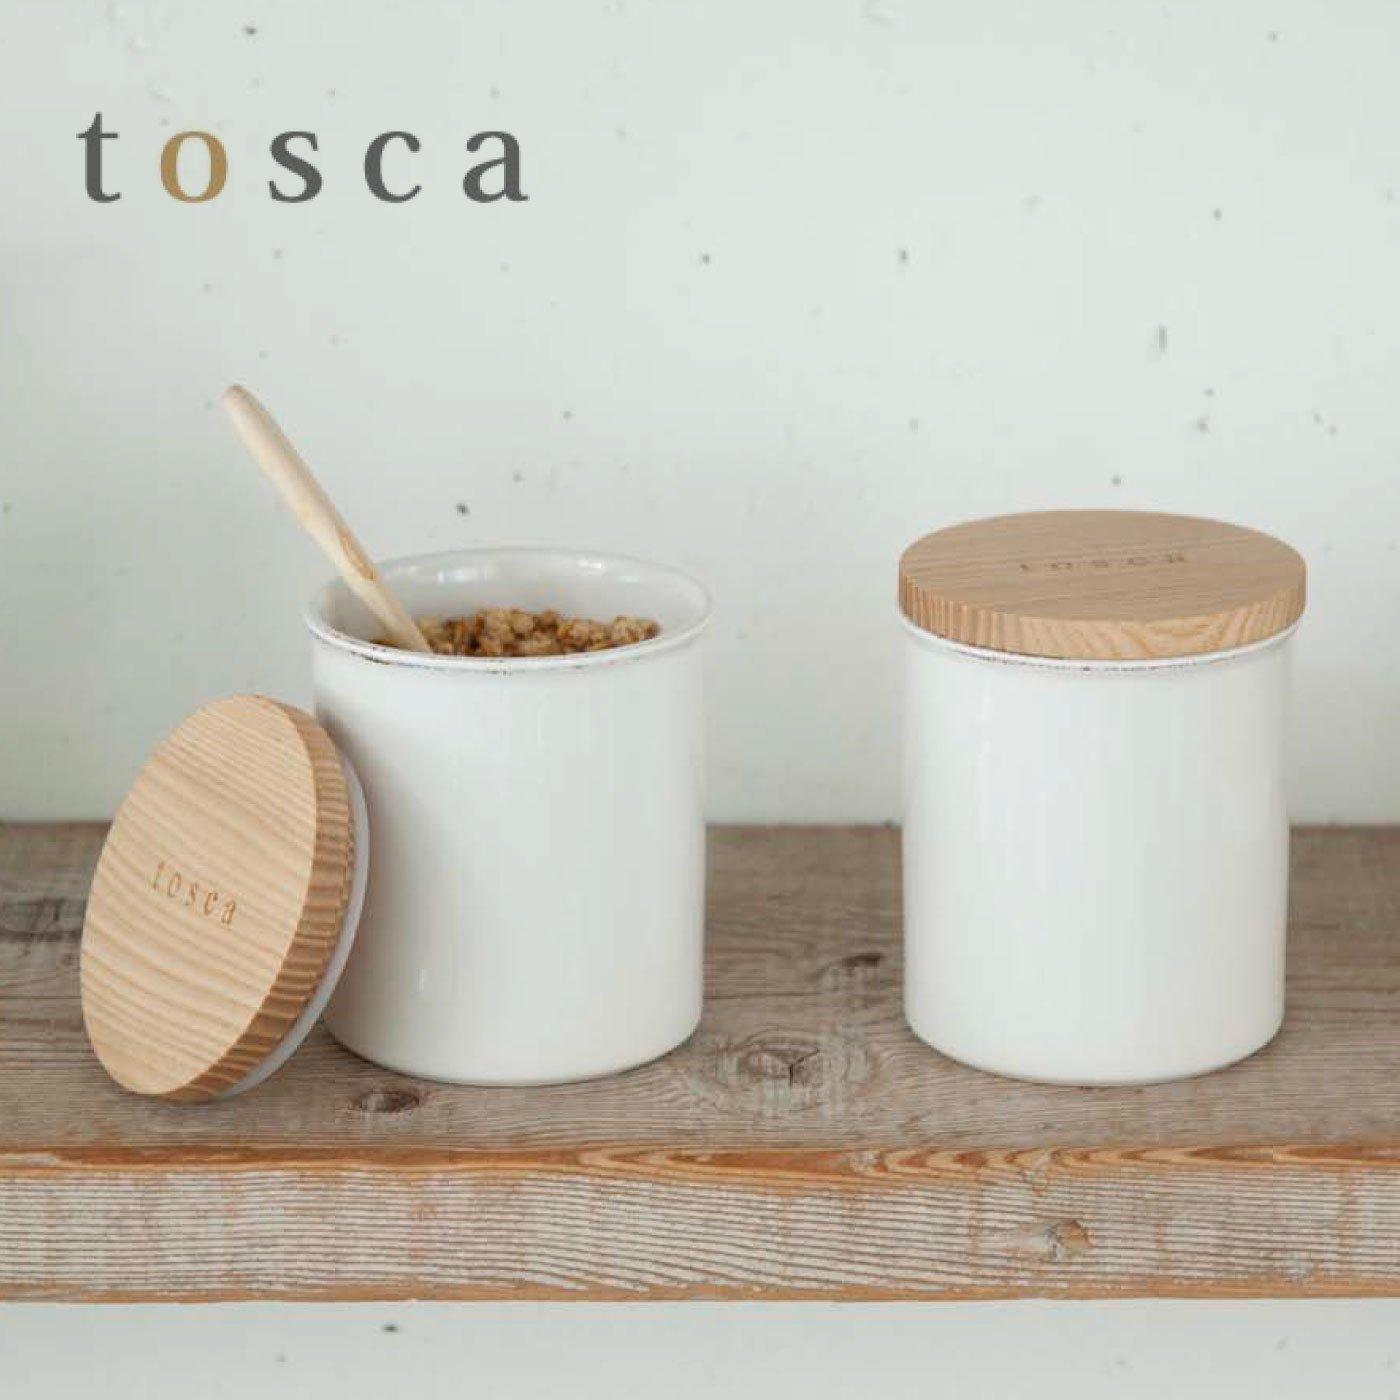 tosca 陶器キャニスター